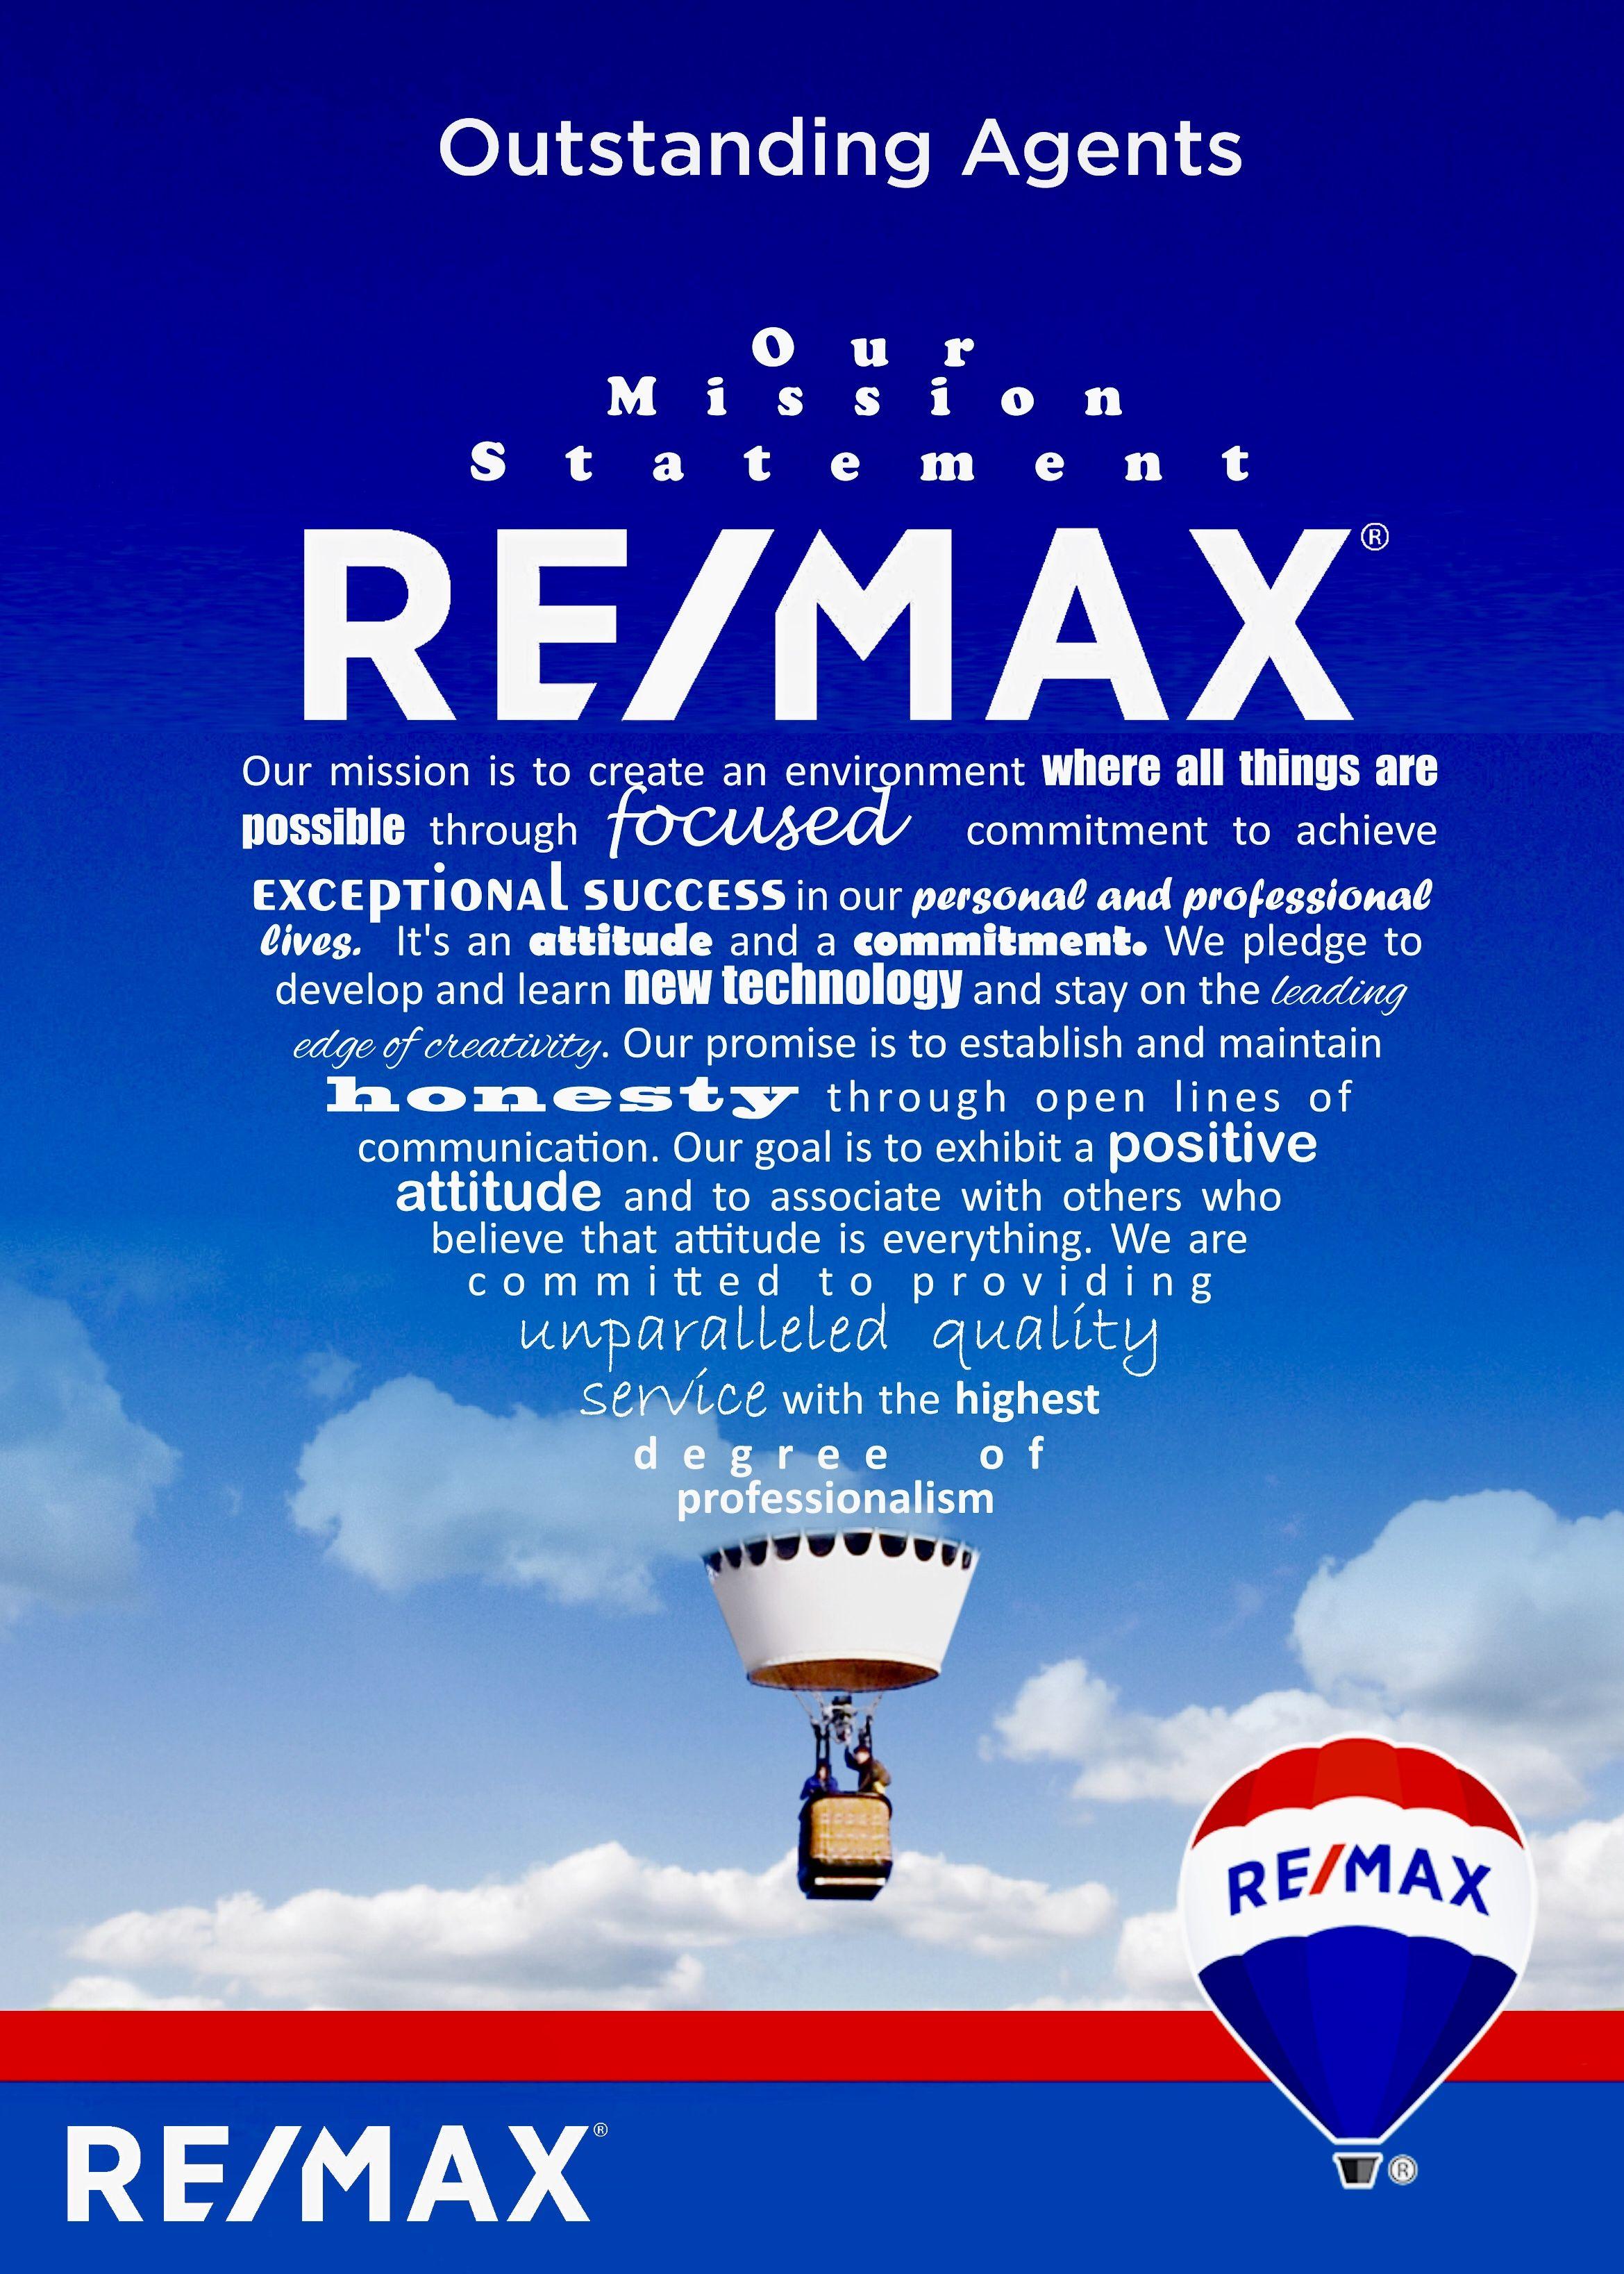 RE/MAX Mission Statement